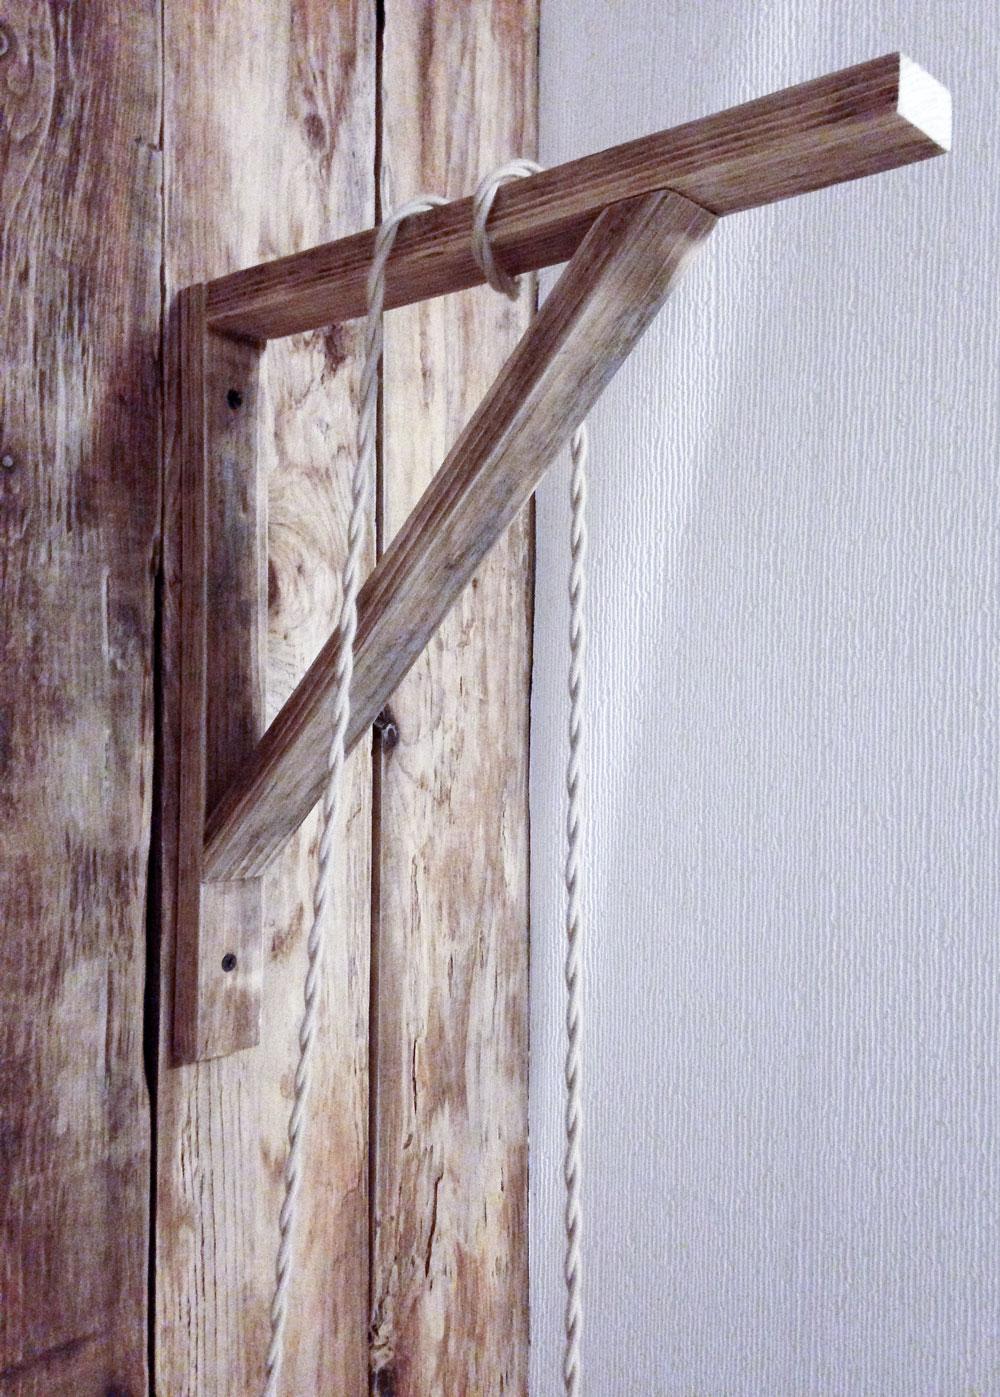 DIY挂笼灯木制支架